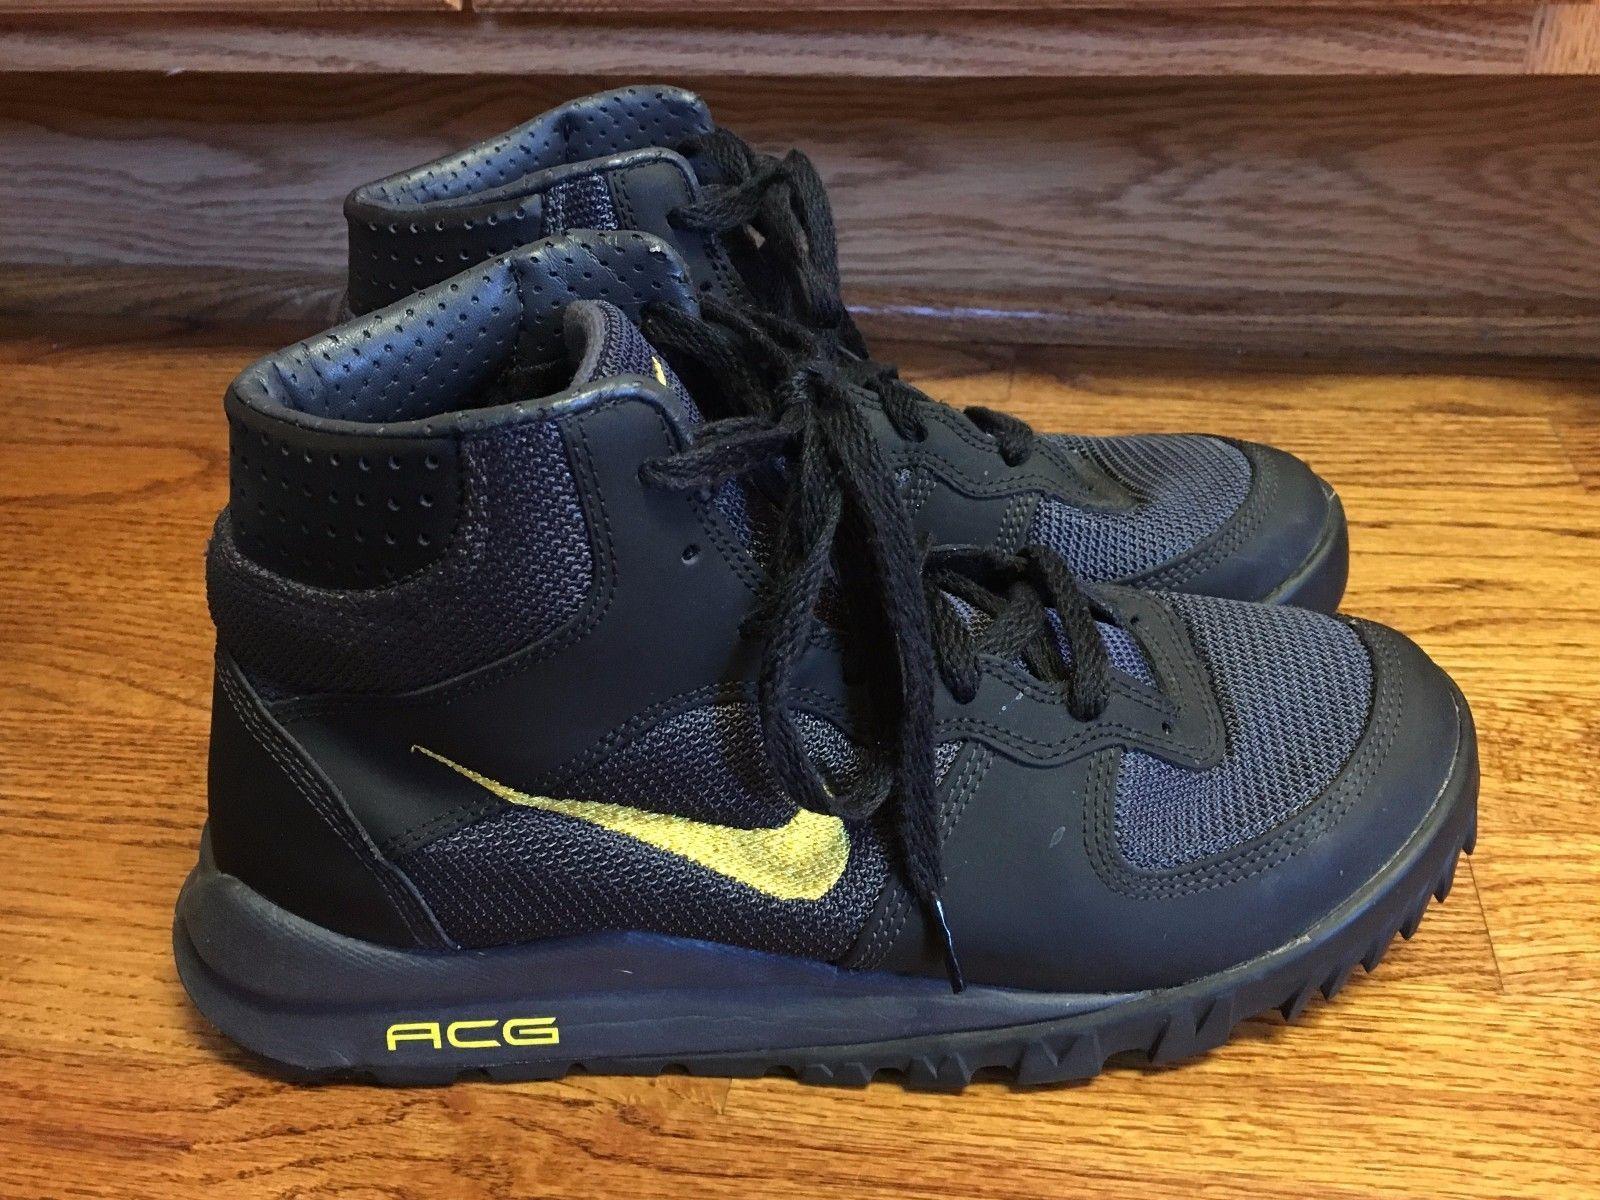 Mens Nike ACG Takos Mid Hiking Trail Boots Shoes 2009 size 8.5 Black  317543-071